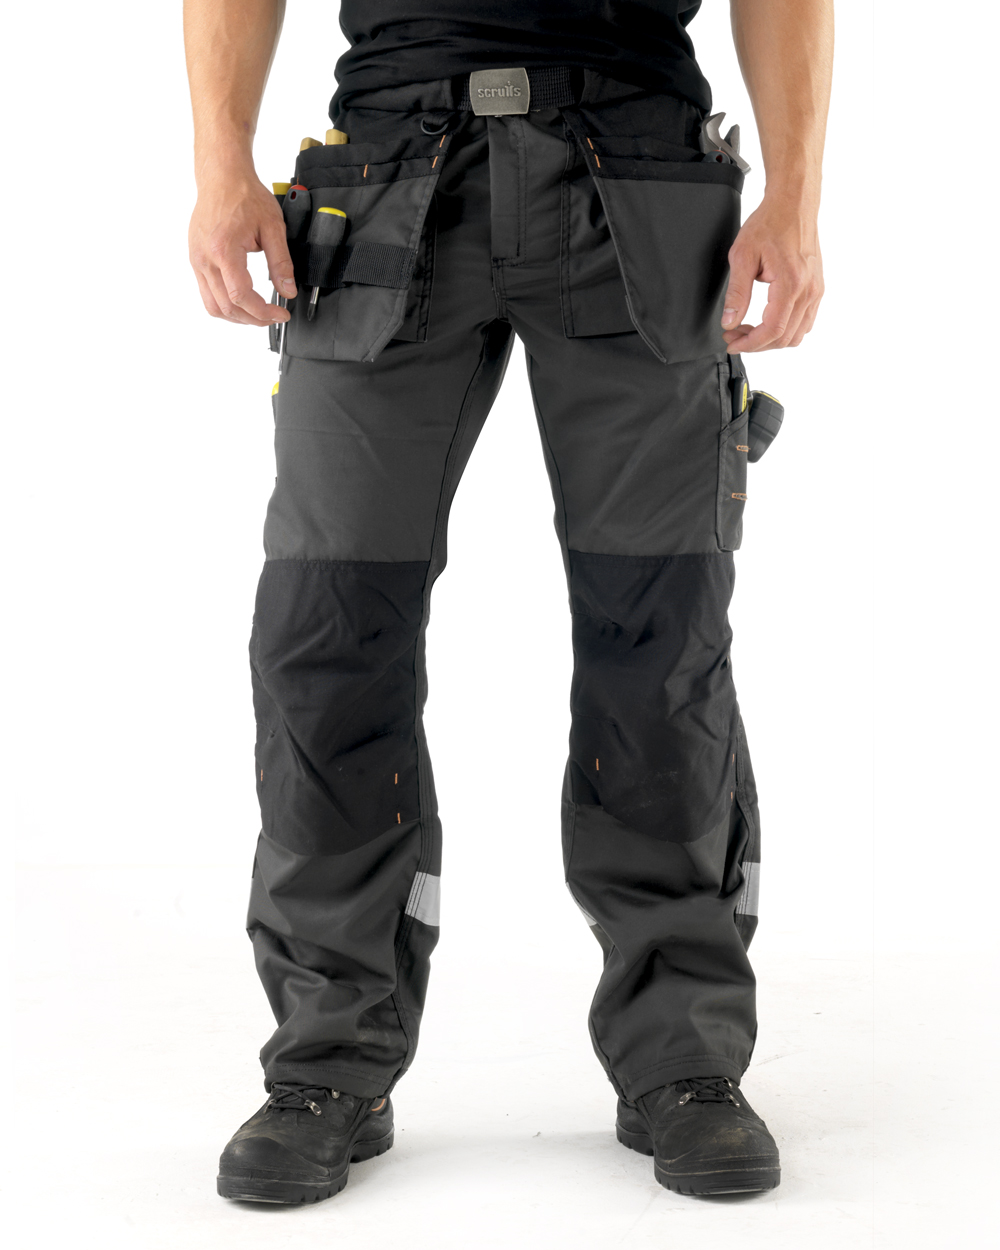 Mens Scruffs 3D Trade Trouser Work Cordura Holster Pants Knee Pad FREE BELT